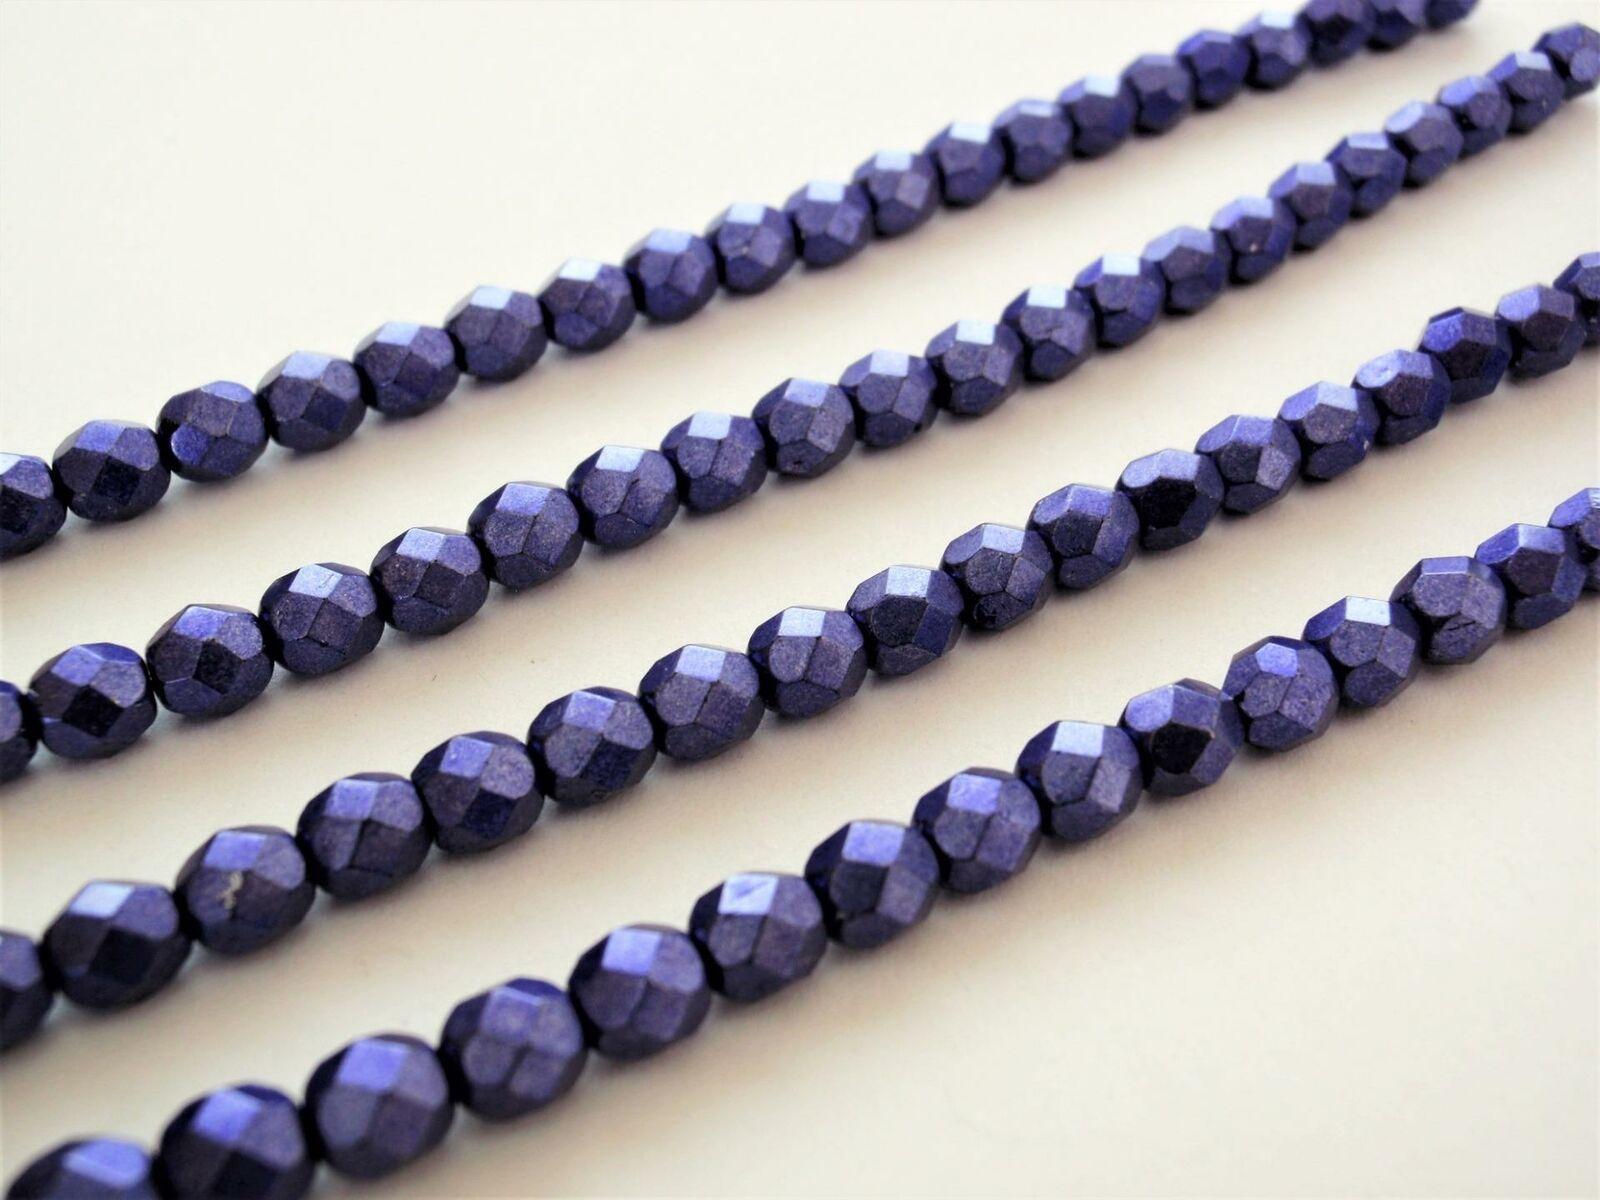 25 6 mm Czech Glass Firepolish Beads: Saturated Metallic - Ultra Violet - $2.32